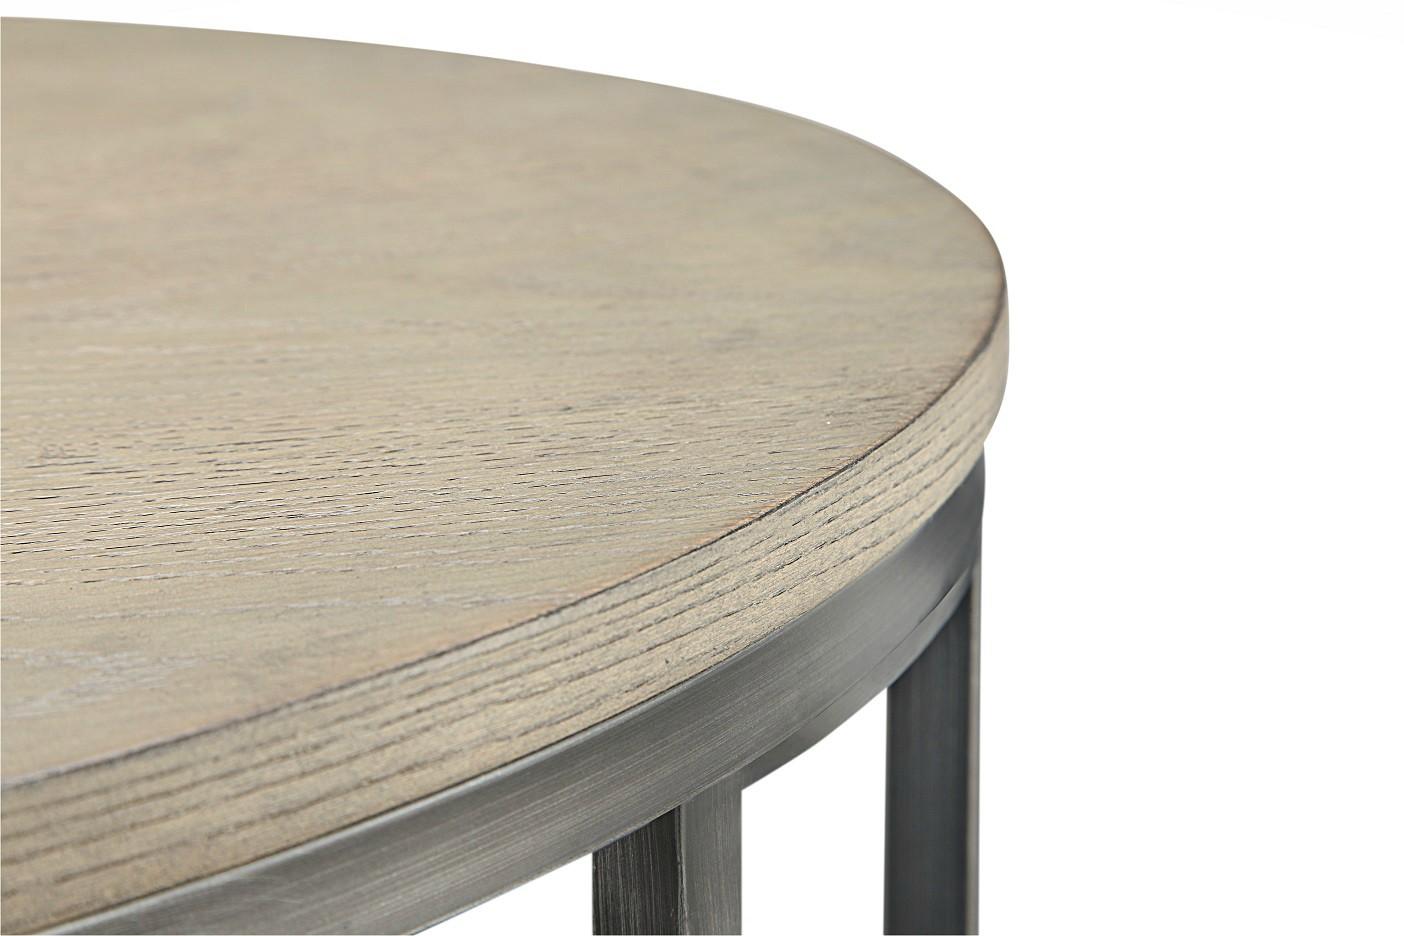 Merveilleux Ava Table Detail